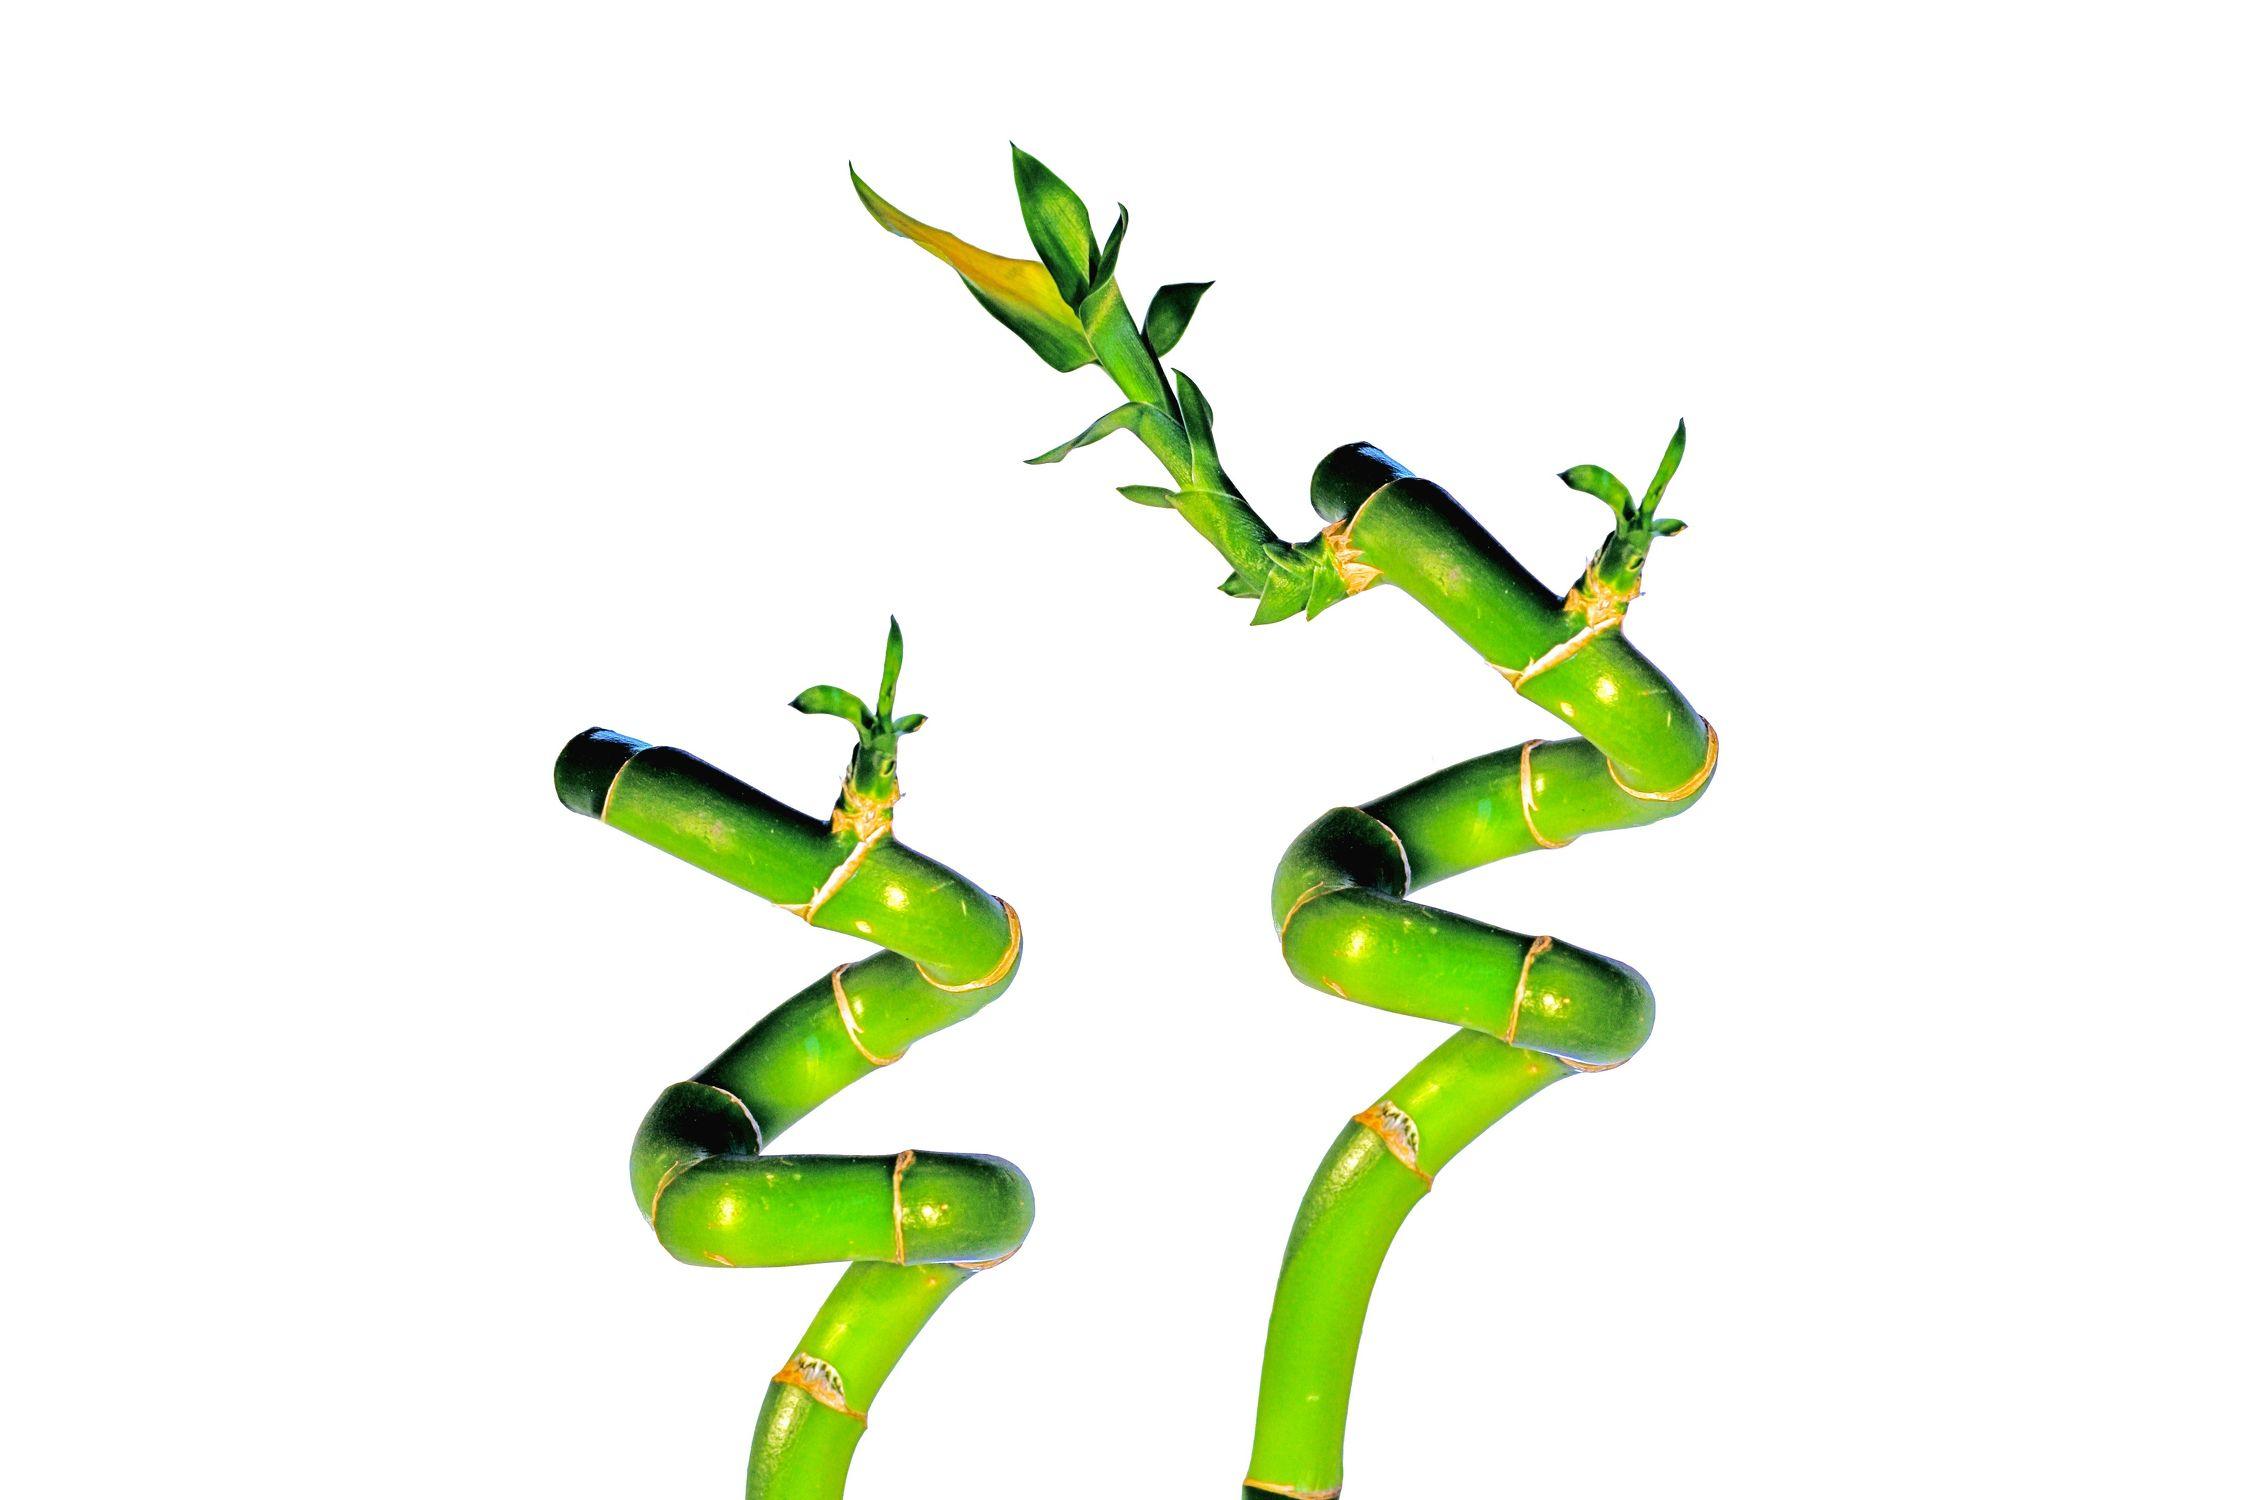 Bild mit Farben, Natur, Grün, Pflanzen, Bambus, Glücksbambus, Bambusoideae, Dracaena braunii syn. sanderiana, Drachenbaum, bamboo, lucky bamboo, zen